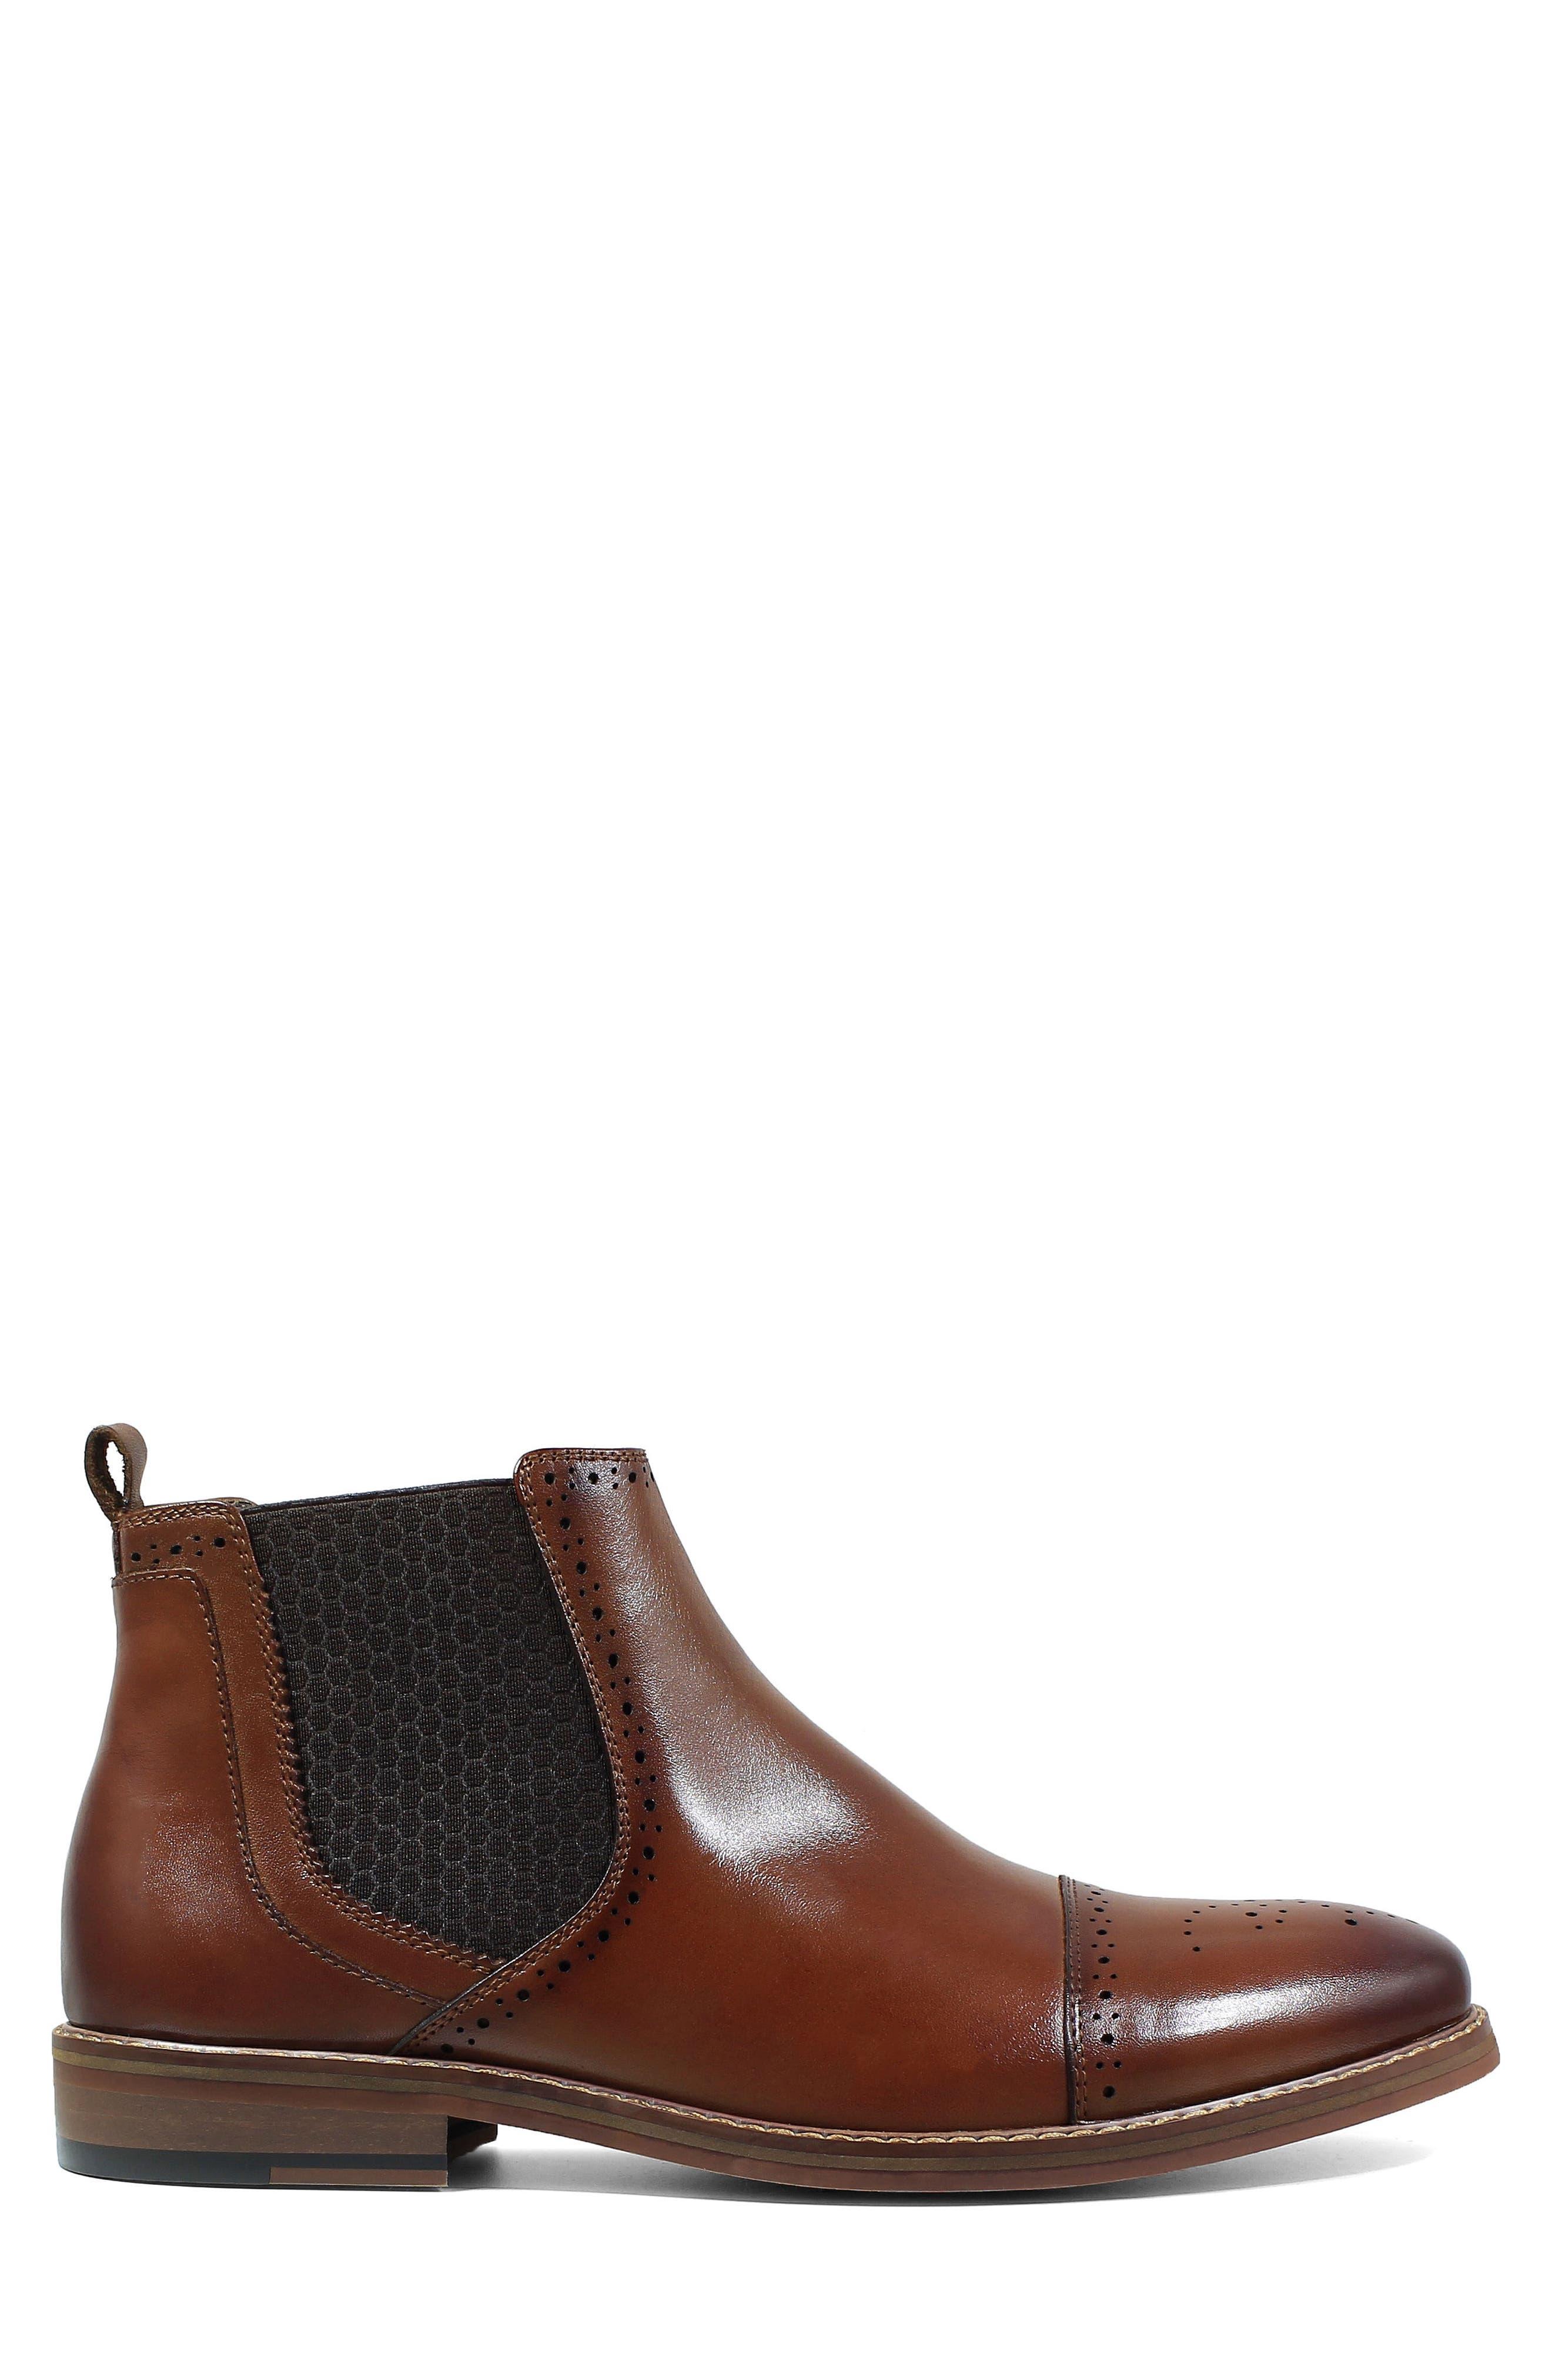 Alomar Chelsea Boot,                             Alternate thumbnail 3, color,                             Cognac Leather